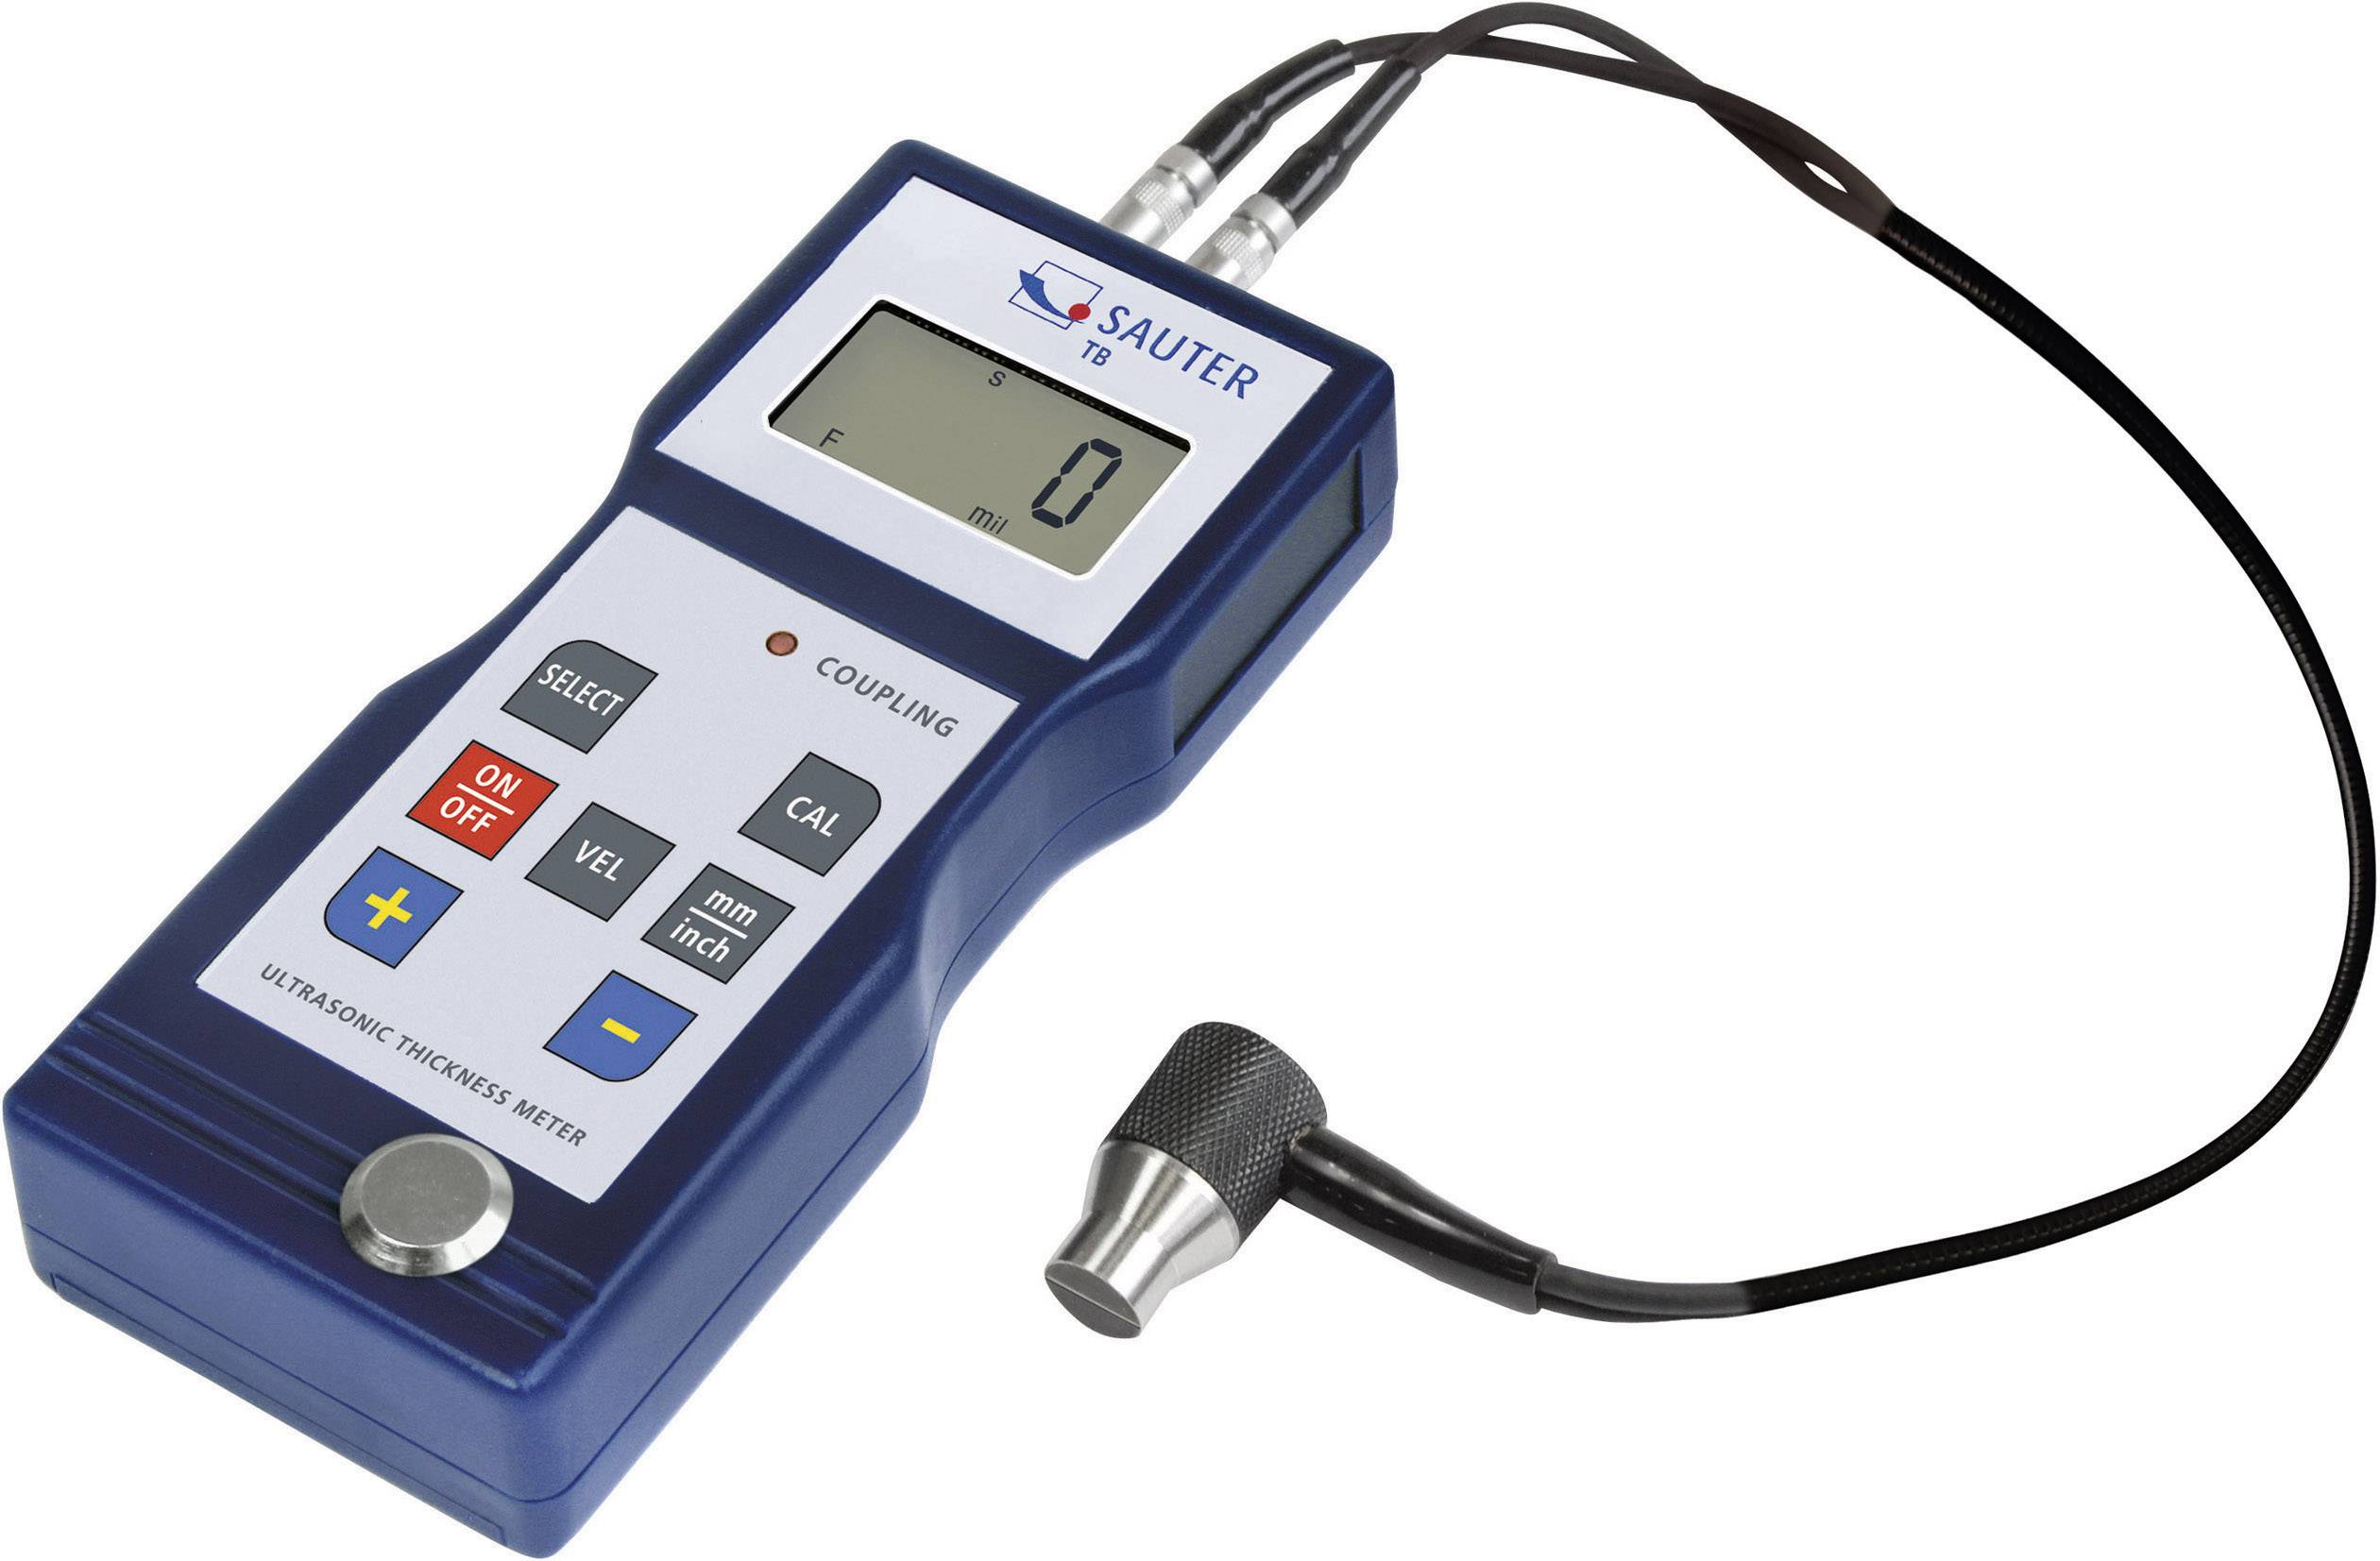 Merač hrúbky materiálov Sauter TB 200-0.1